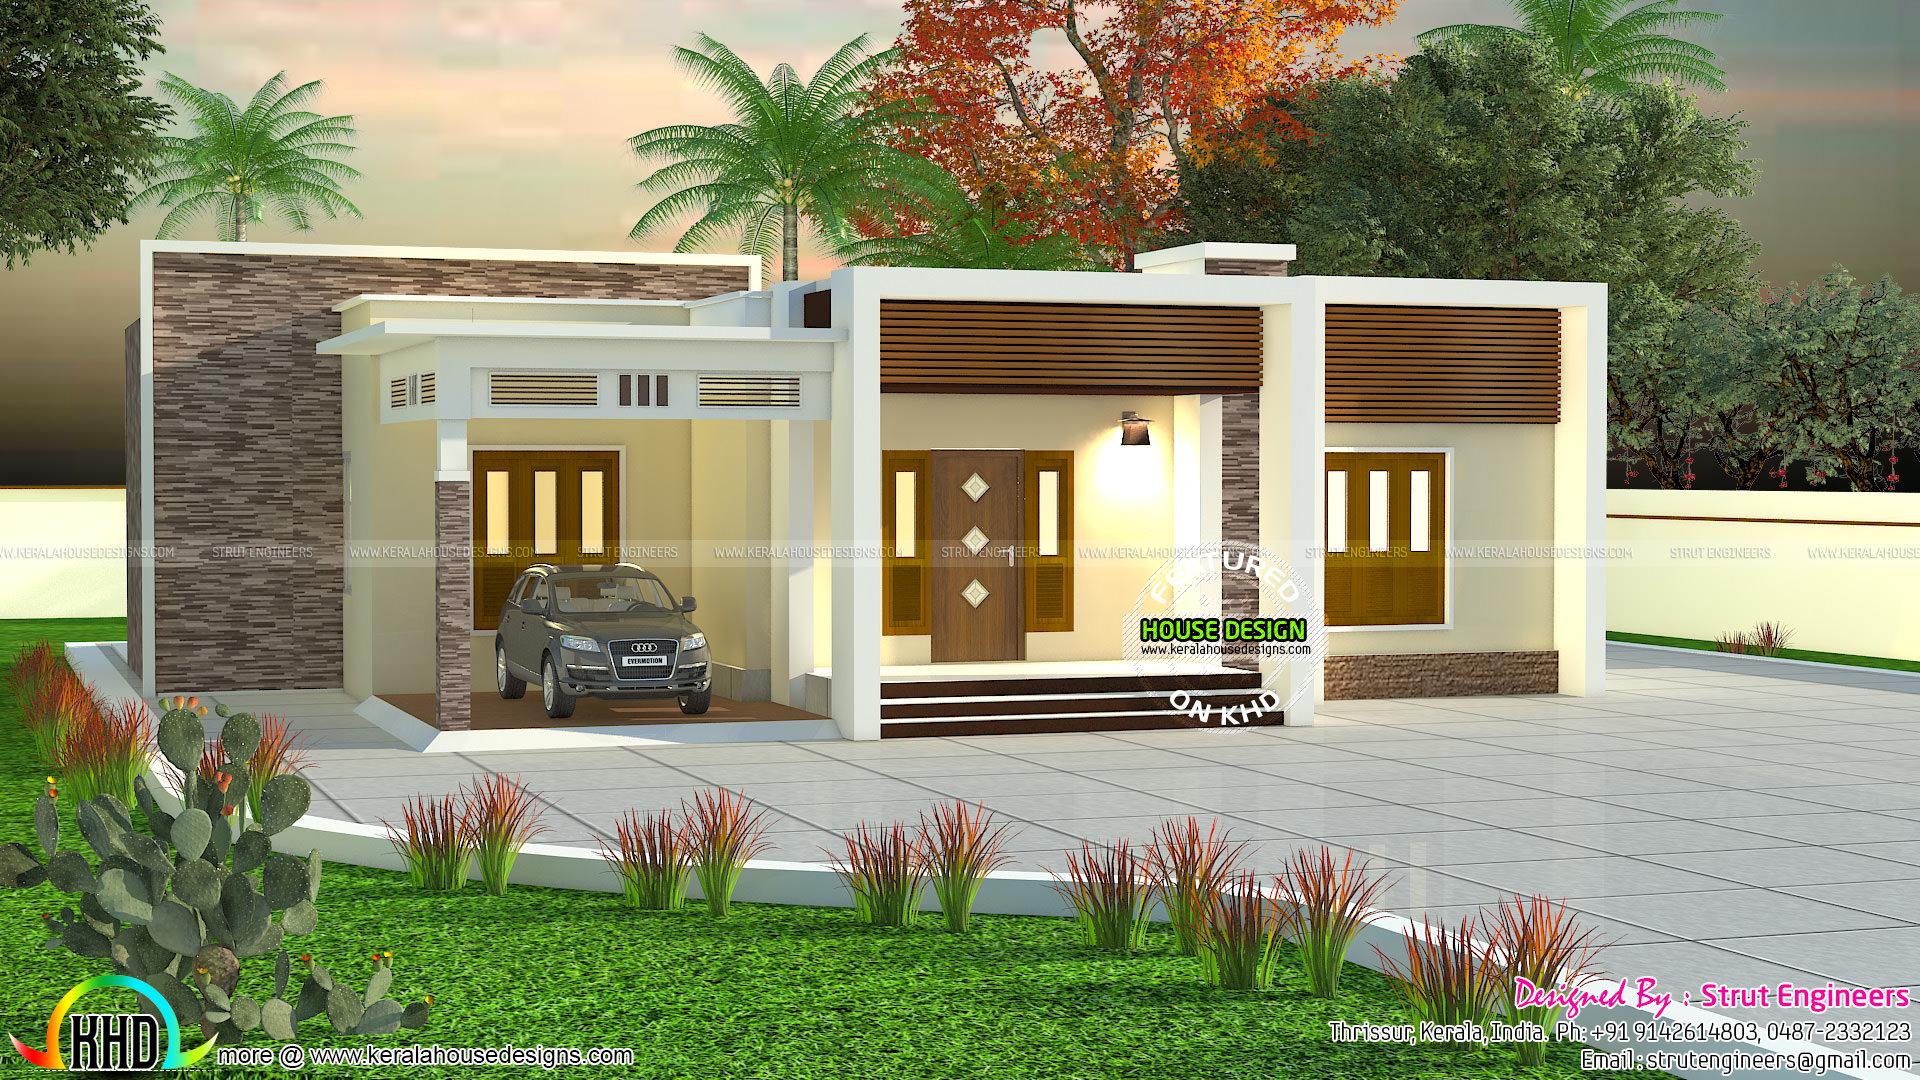 900 Sq Ft 2 Bhk Flat Roof House Kerala Home Design